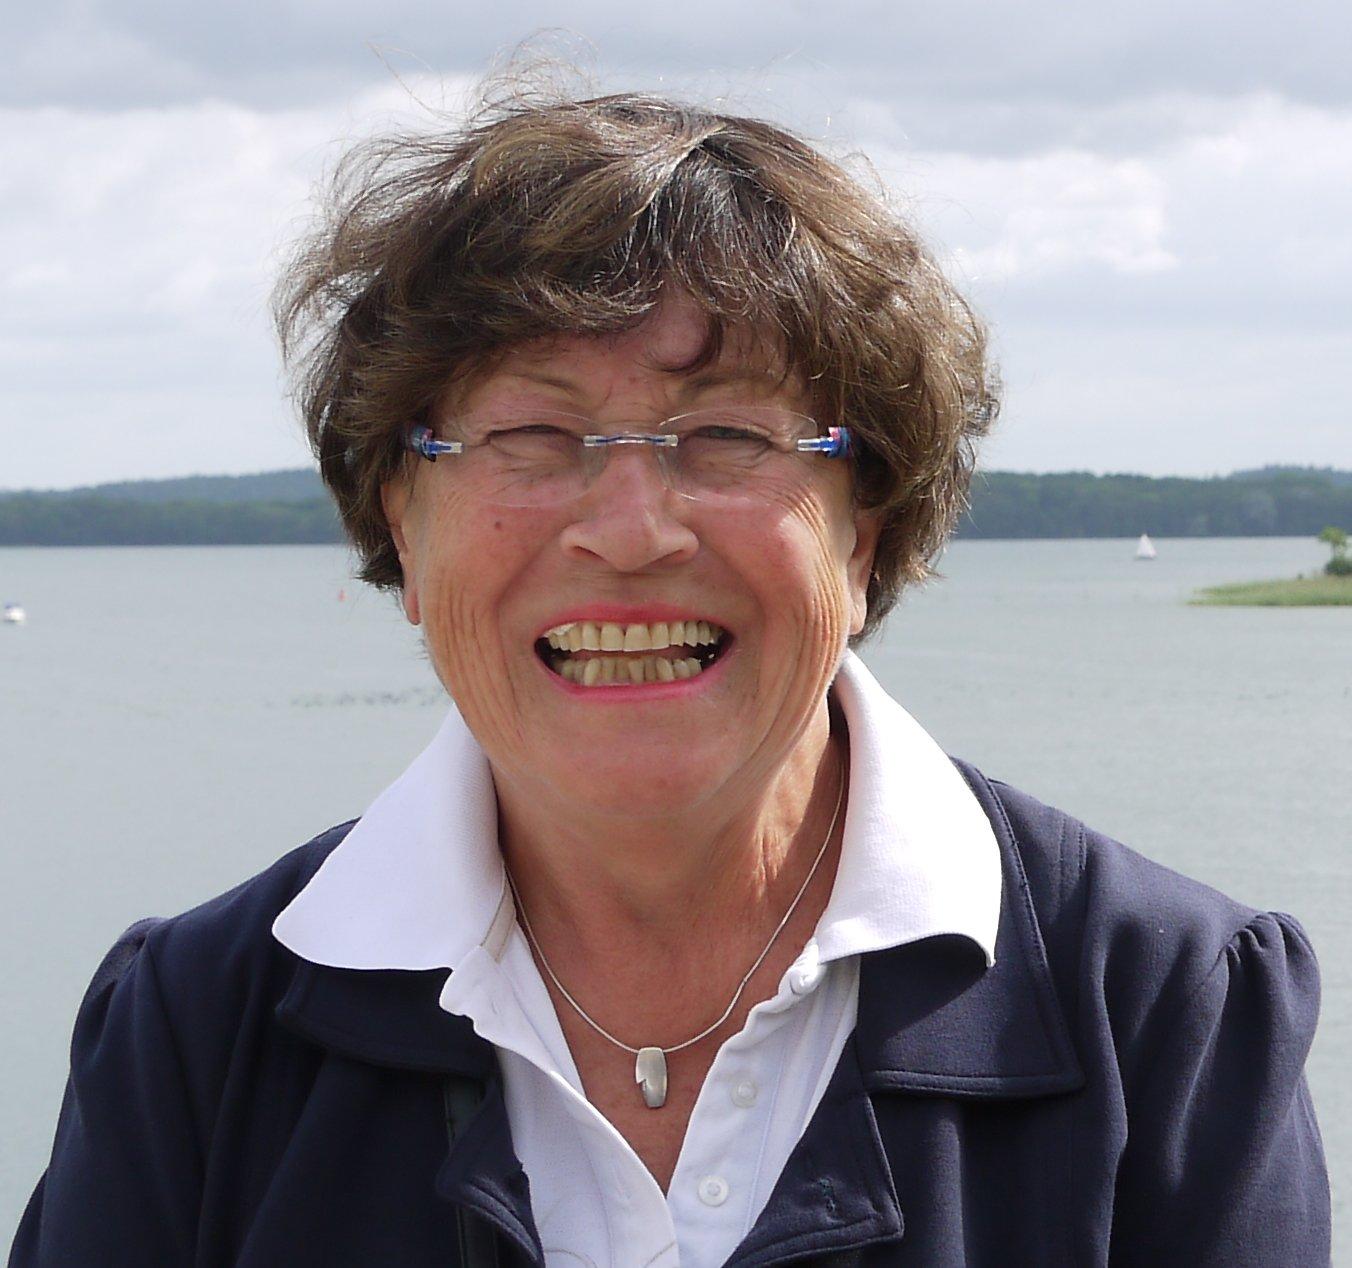 SBI Christa Loesch-Goldschmidt